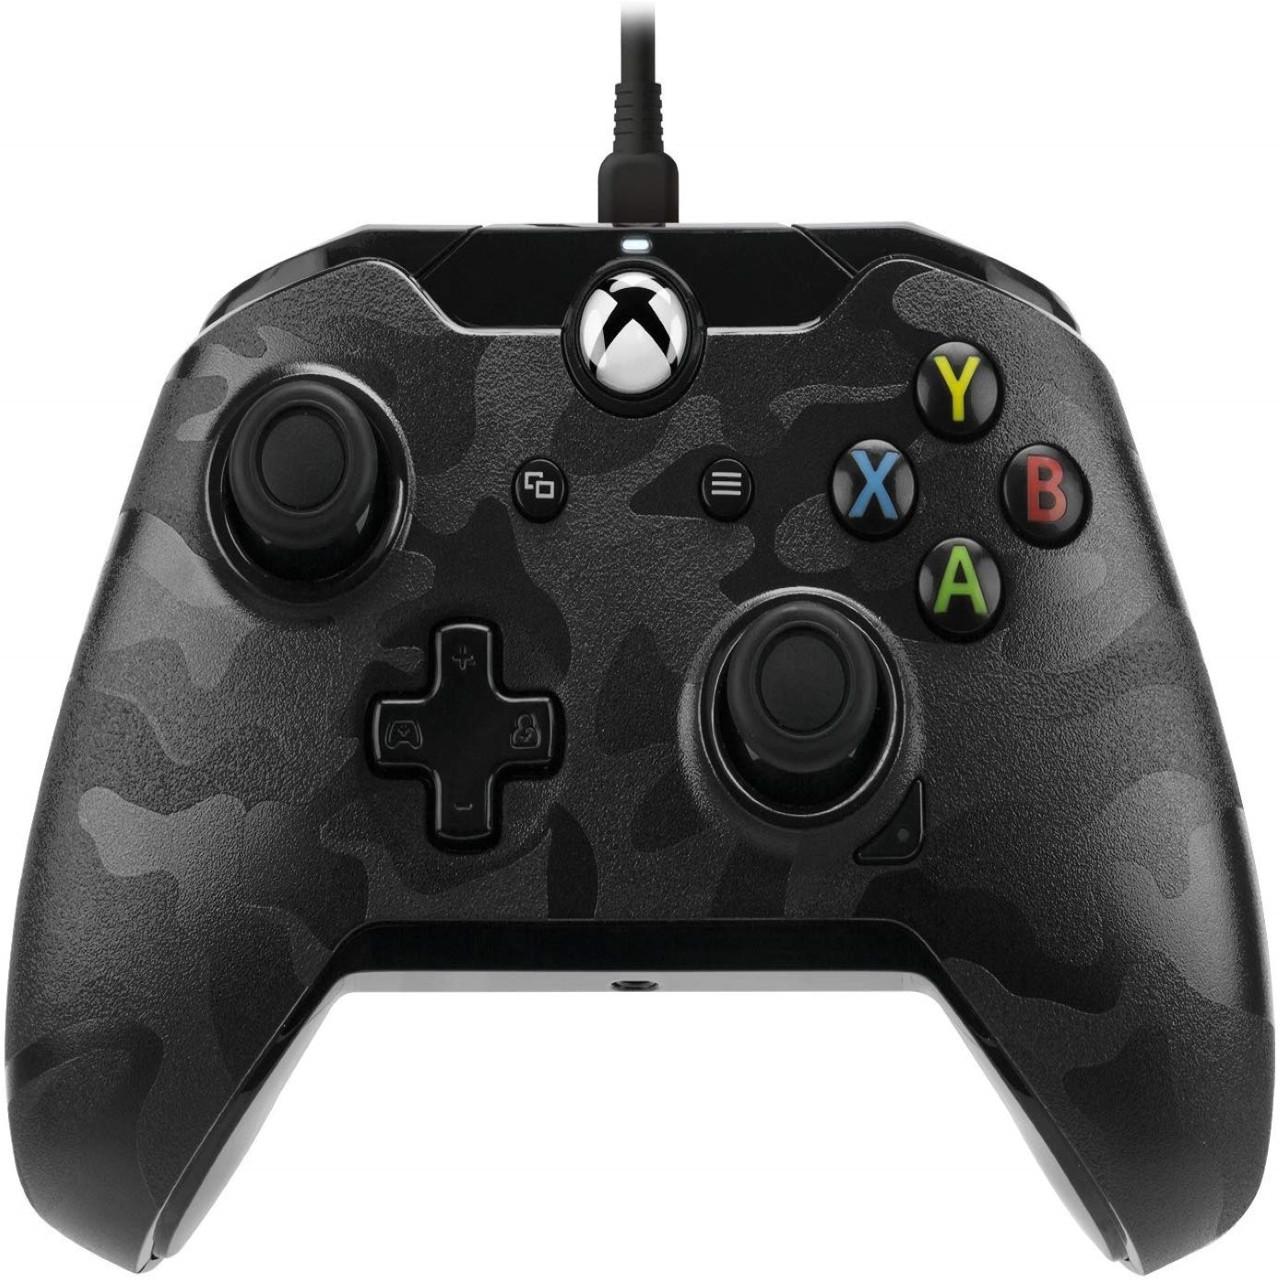 Геймпад (джойстик) Microsoft Xbox ONE,PC Wired Controller PDP XO Black-Camo (провідний)